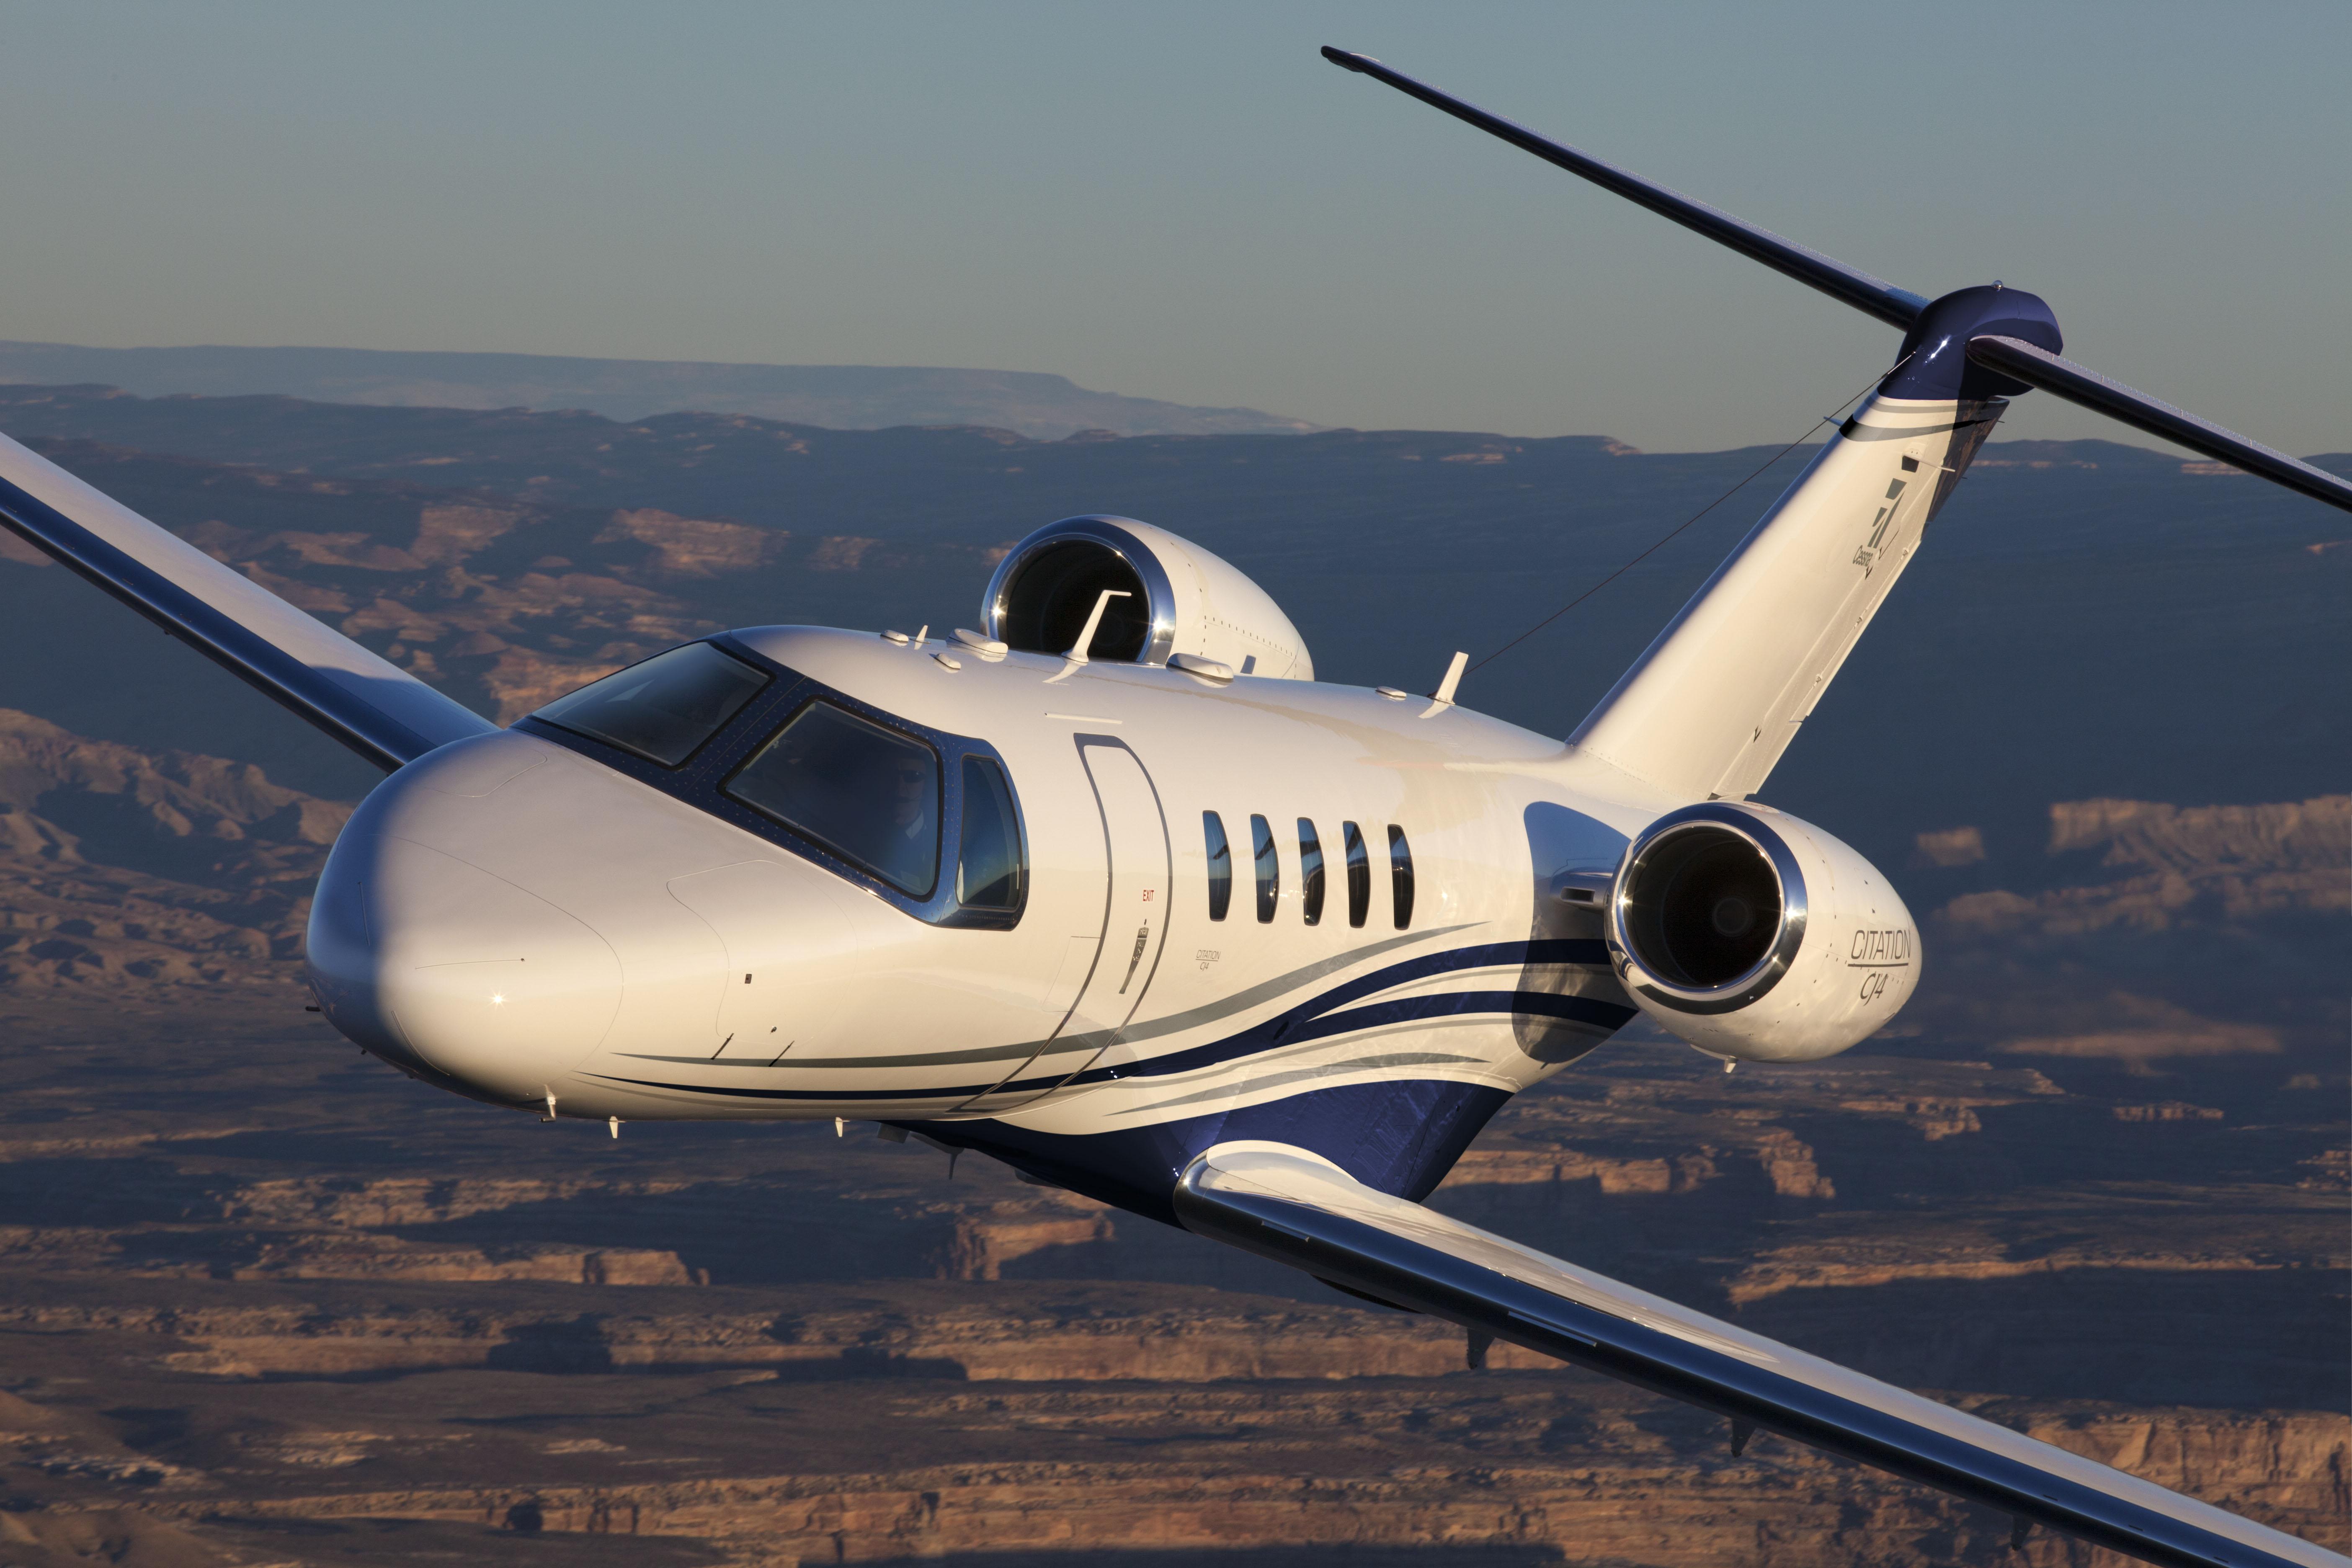 Textron Aviation - Cessna Citation CJ4